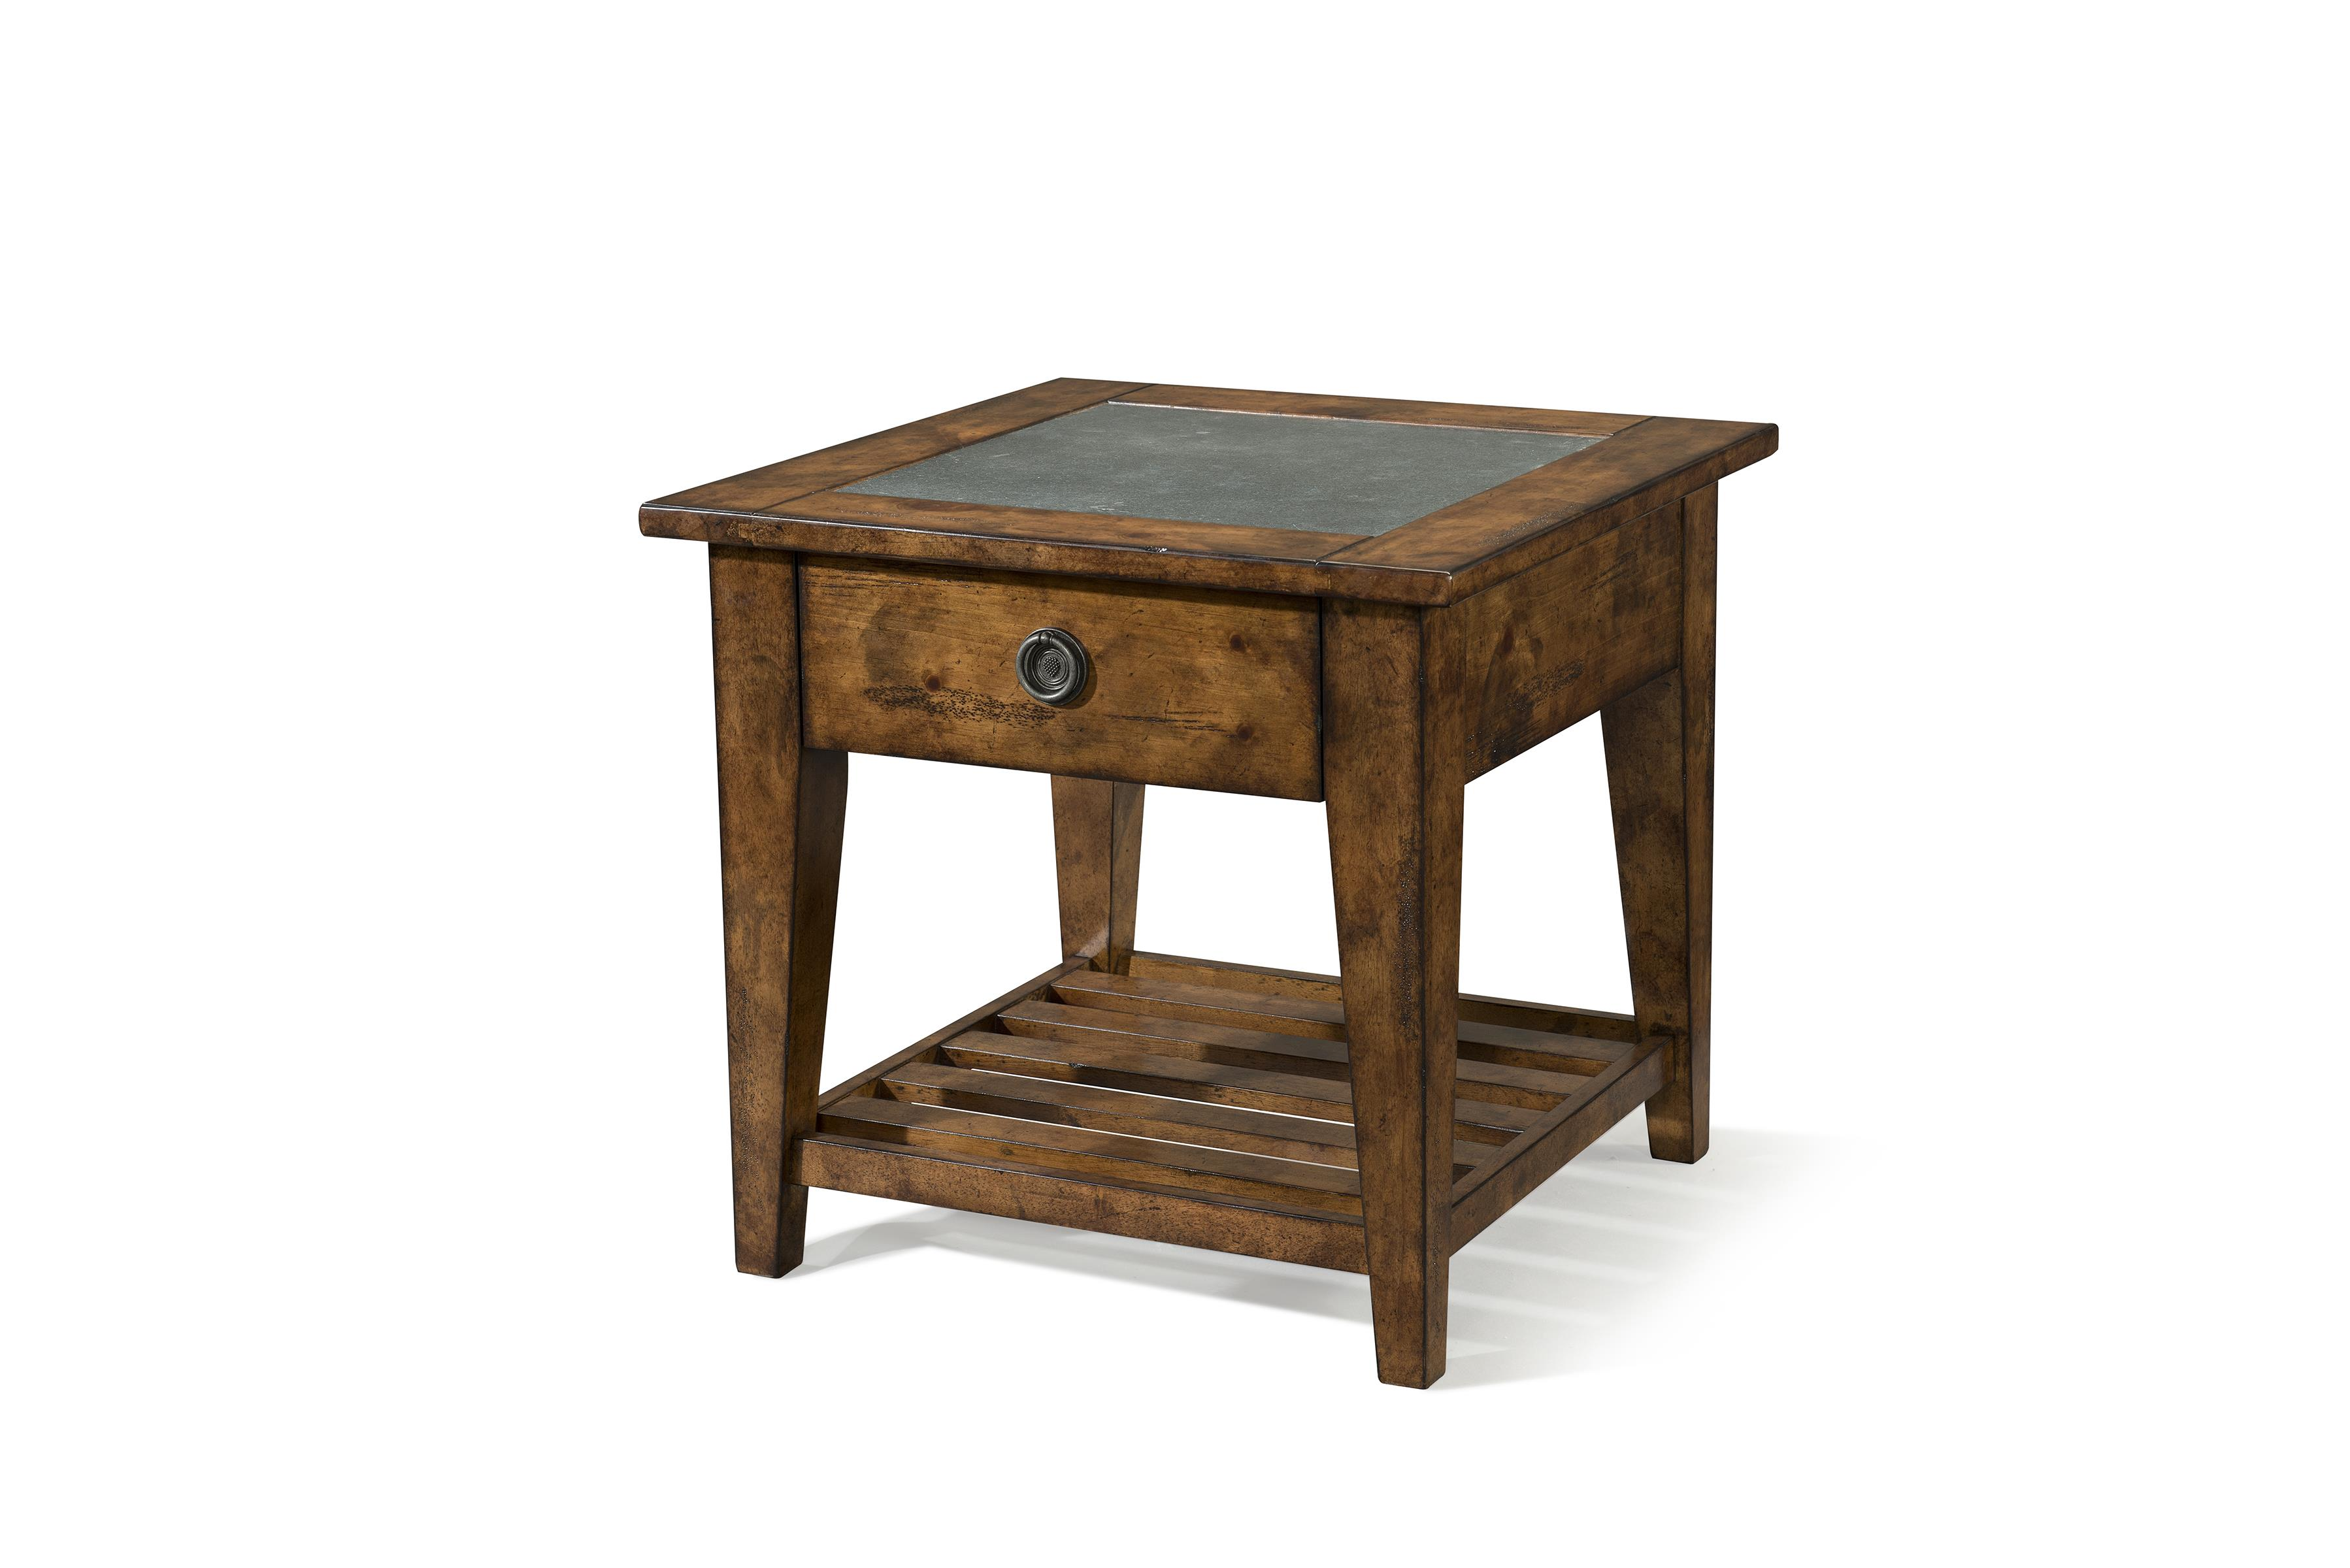 Easton Collection Farmhouse Dogleg Lamp Table - Item Number: 436-816 ETBL